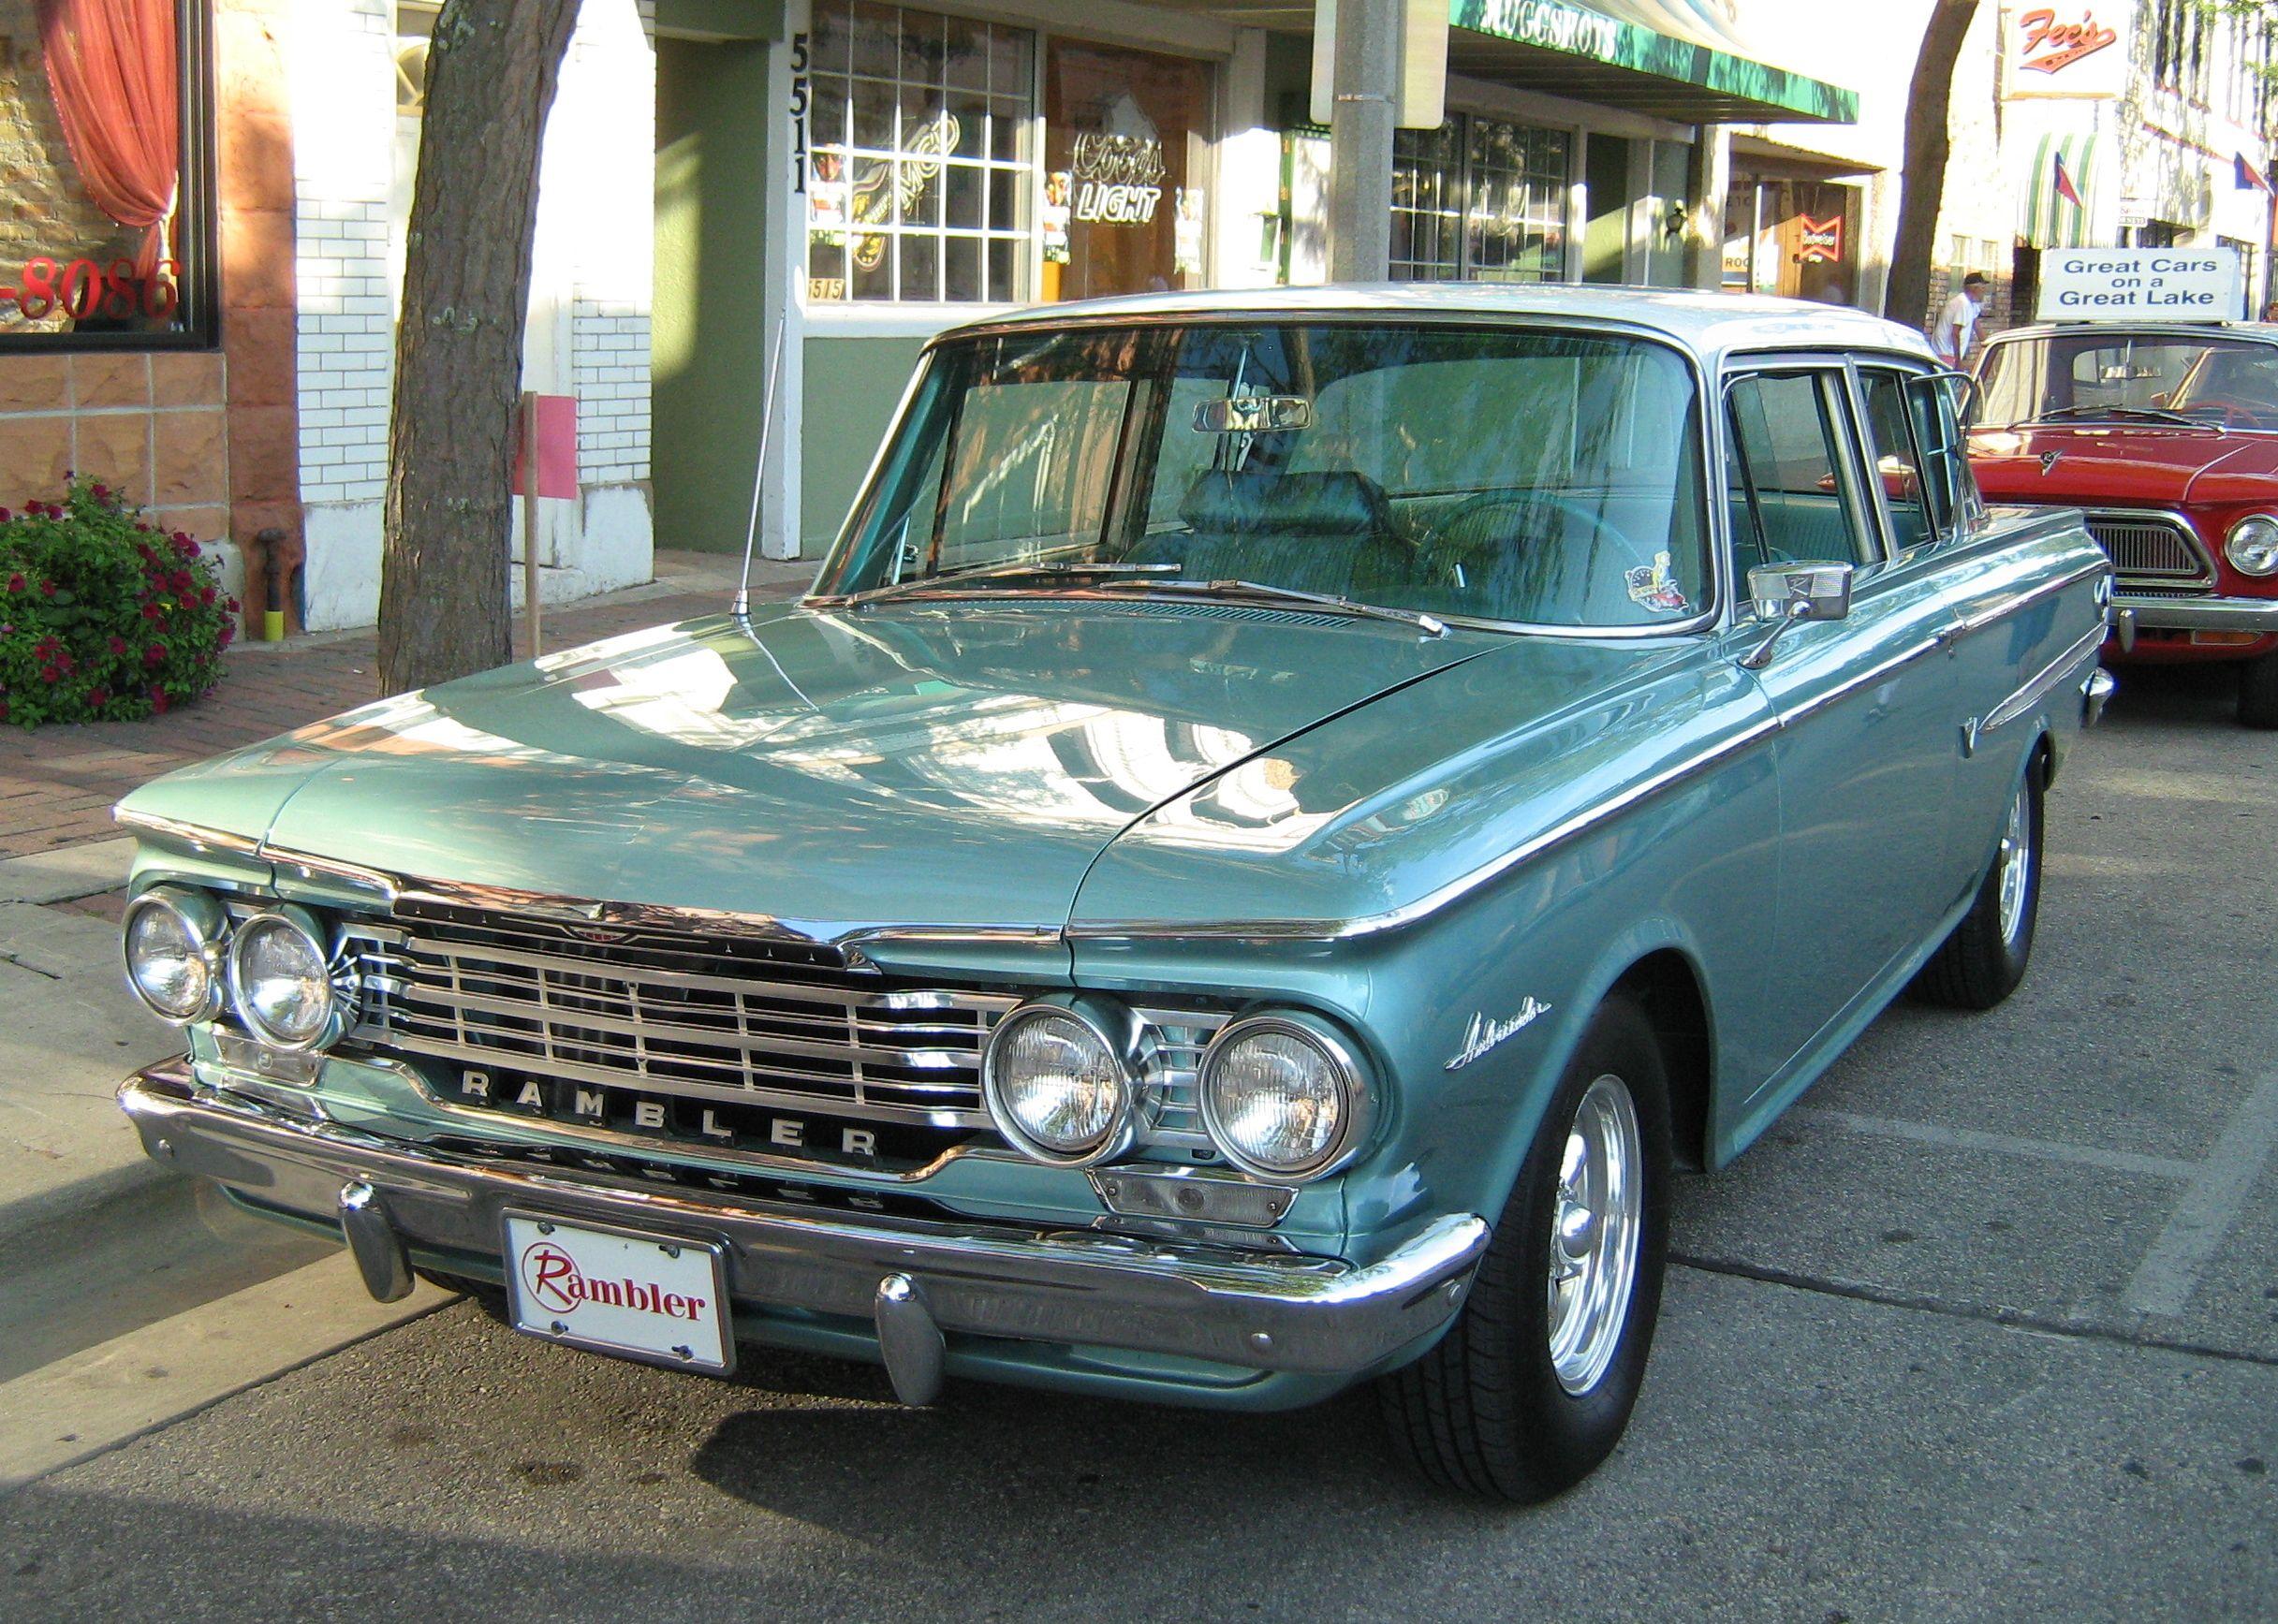 1962 Amc Rambler For Sale Listing Id Cc 1129487 Classiccars Com Driveyourdream Amc Amcrambler Rambler Pony Car Amc